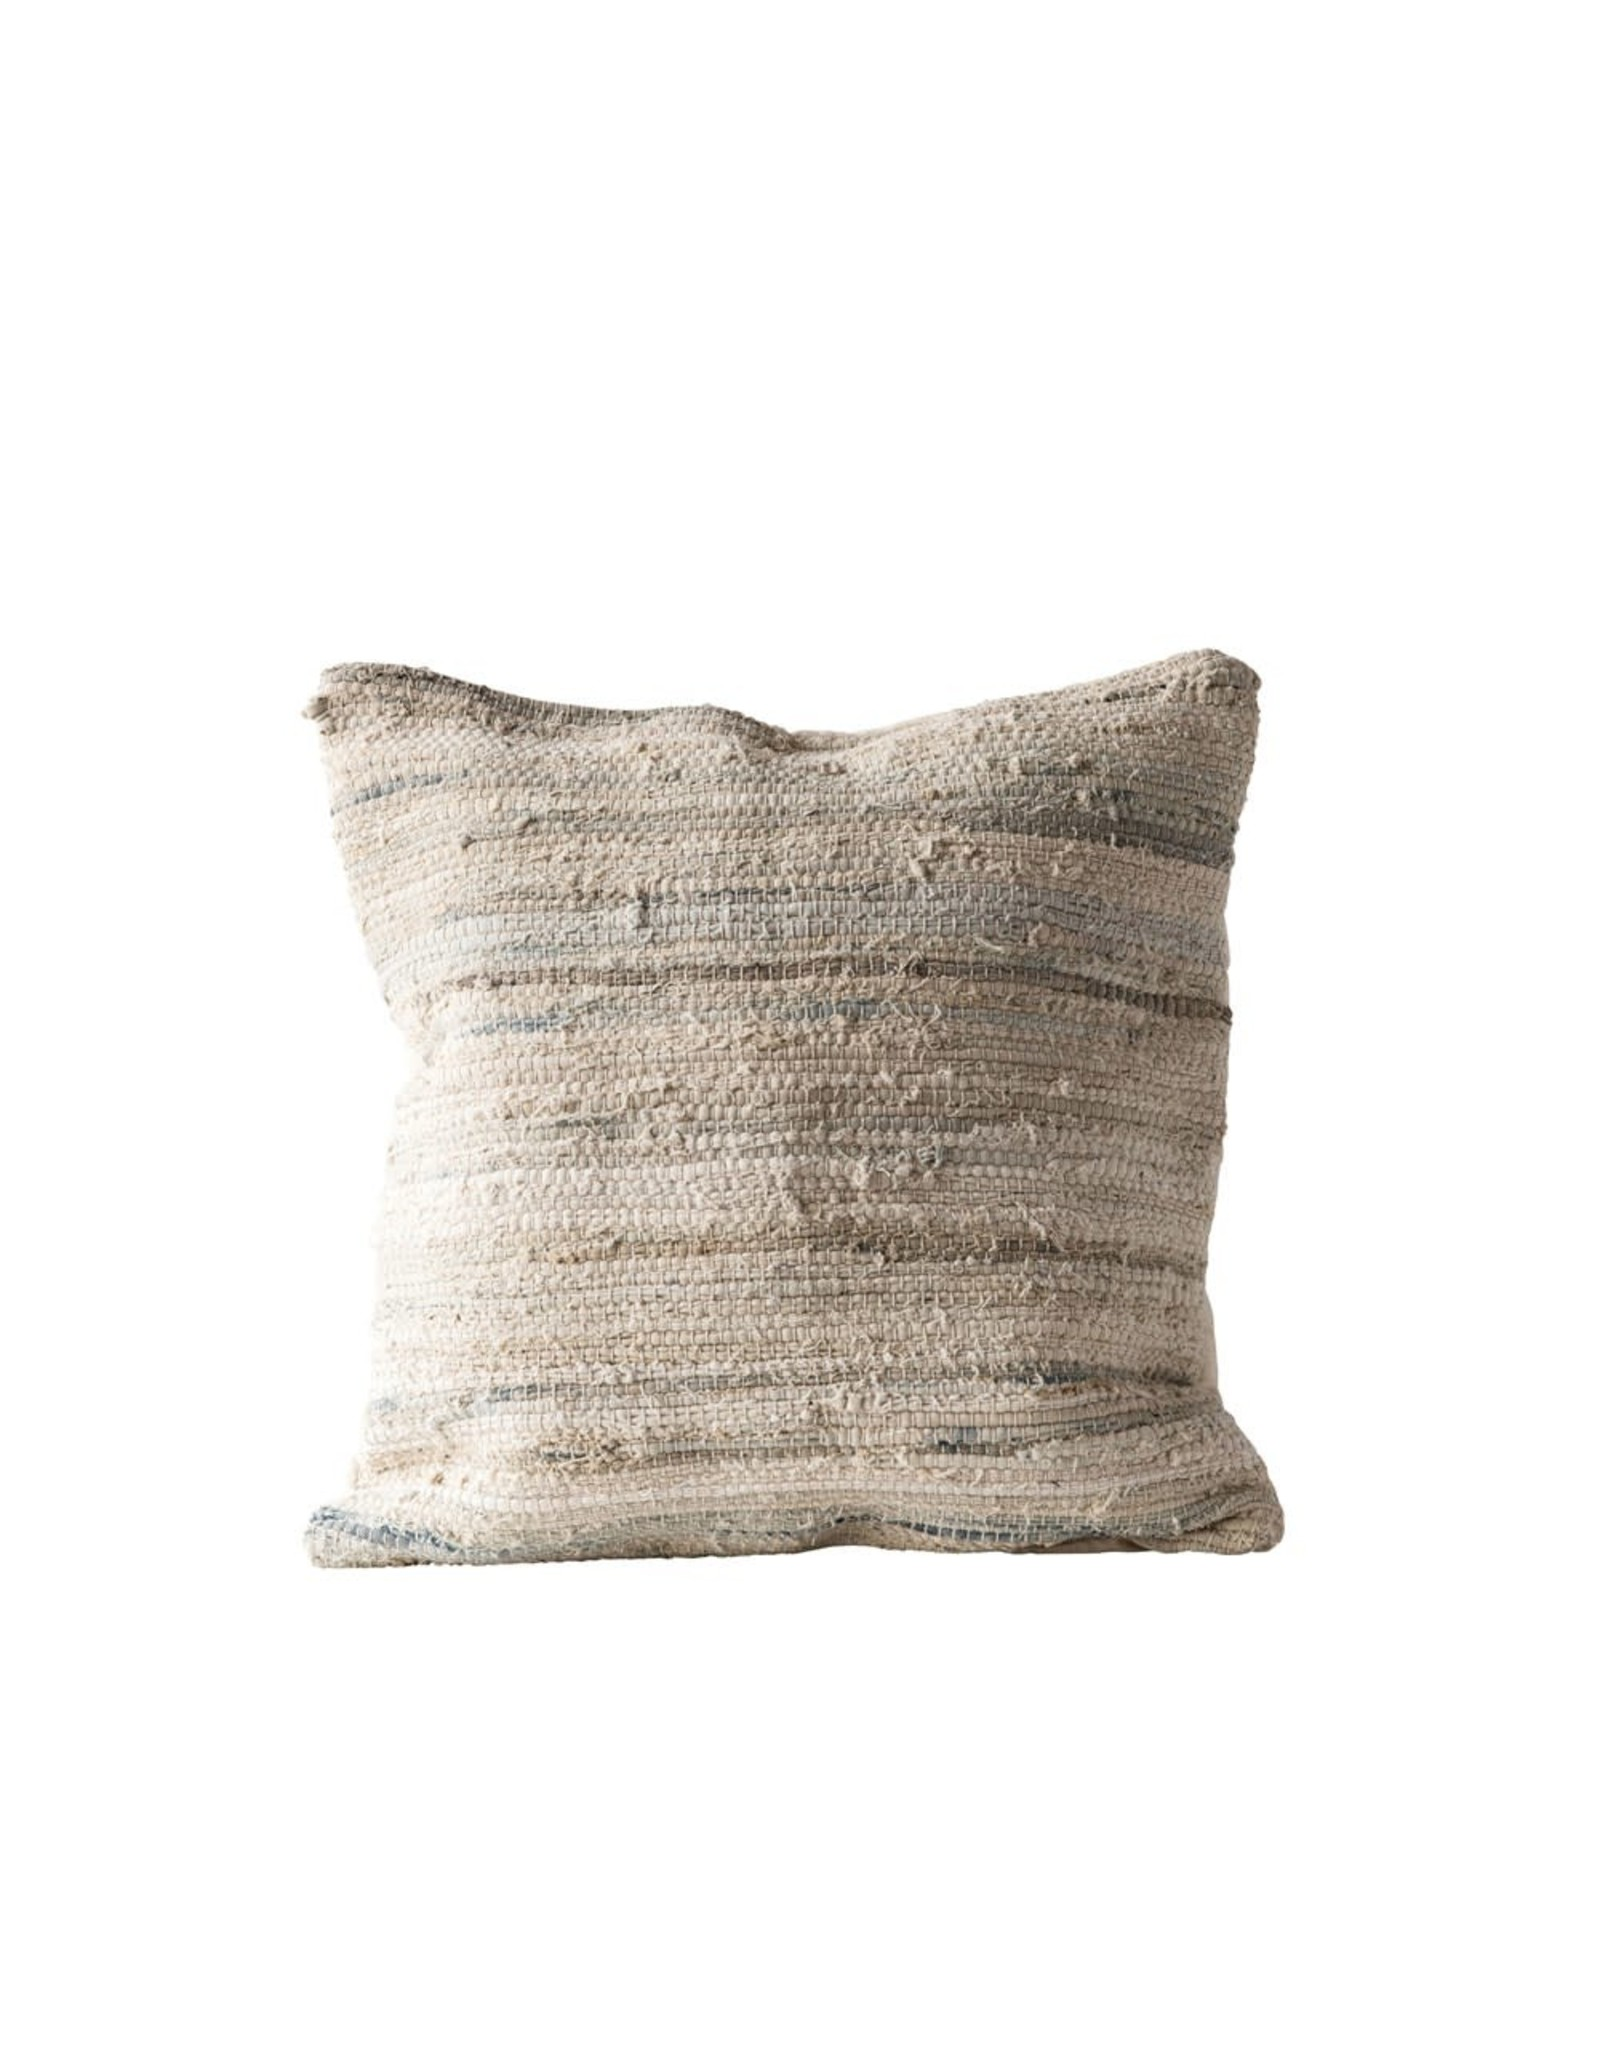 "The Florist & The Merchant 24"" Cotton & Chindi Canvas Pillow"